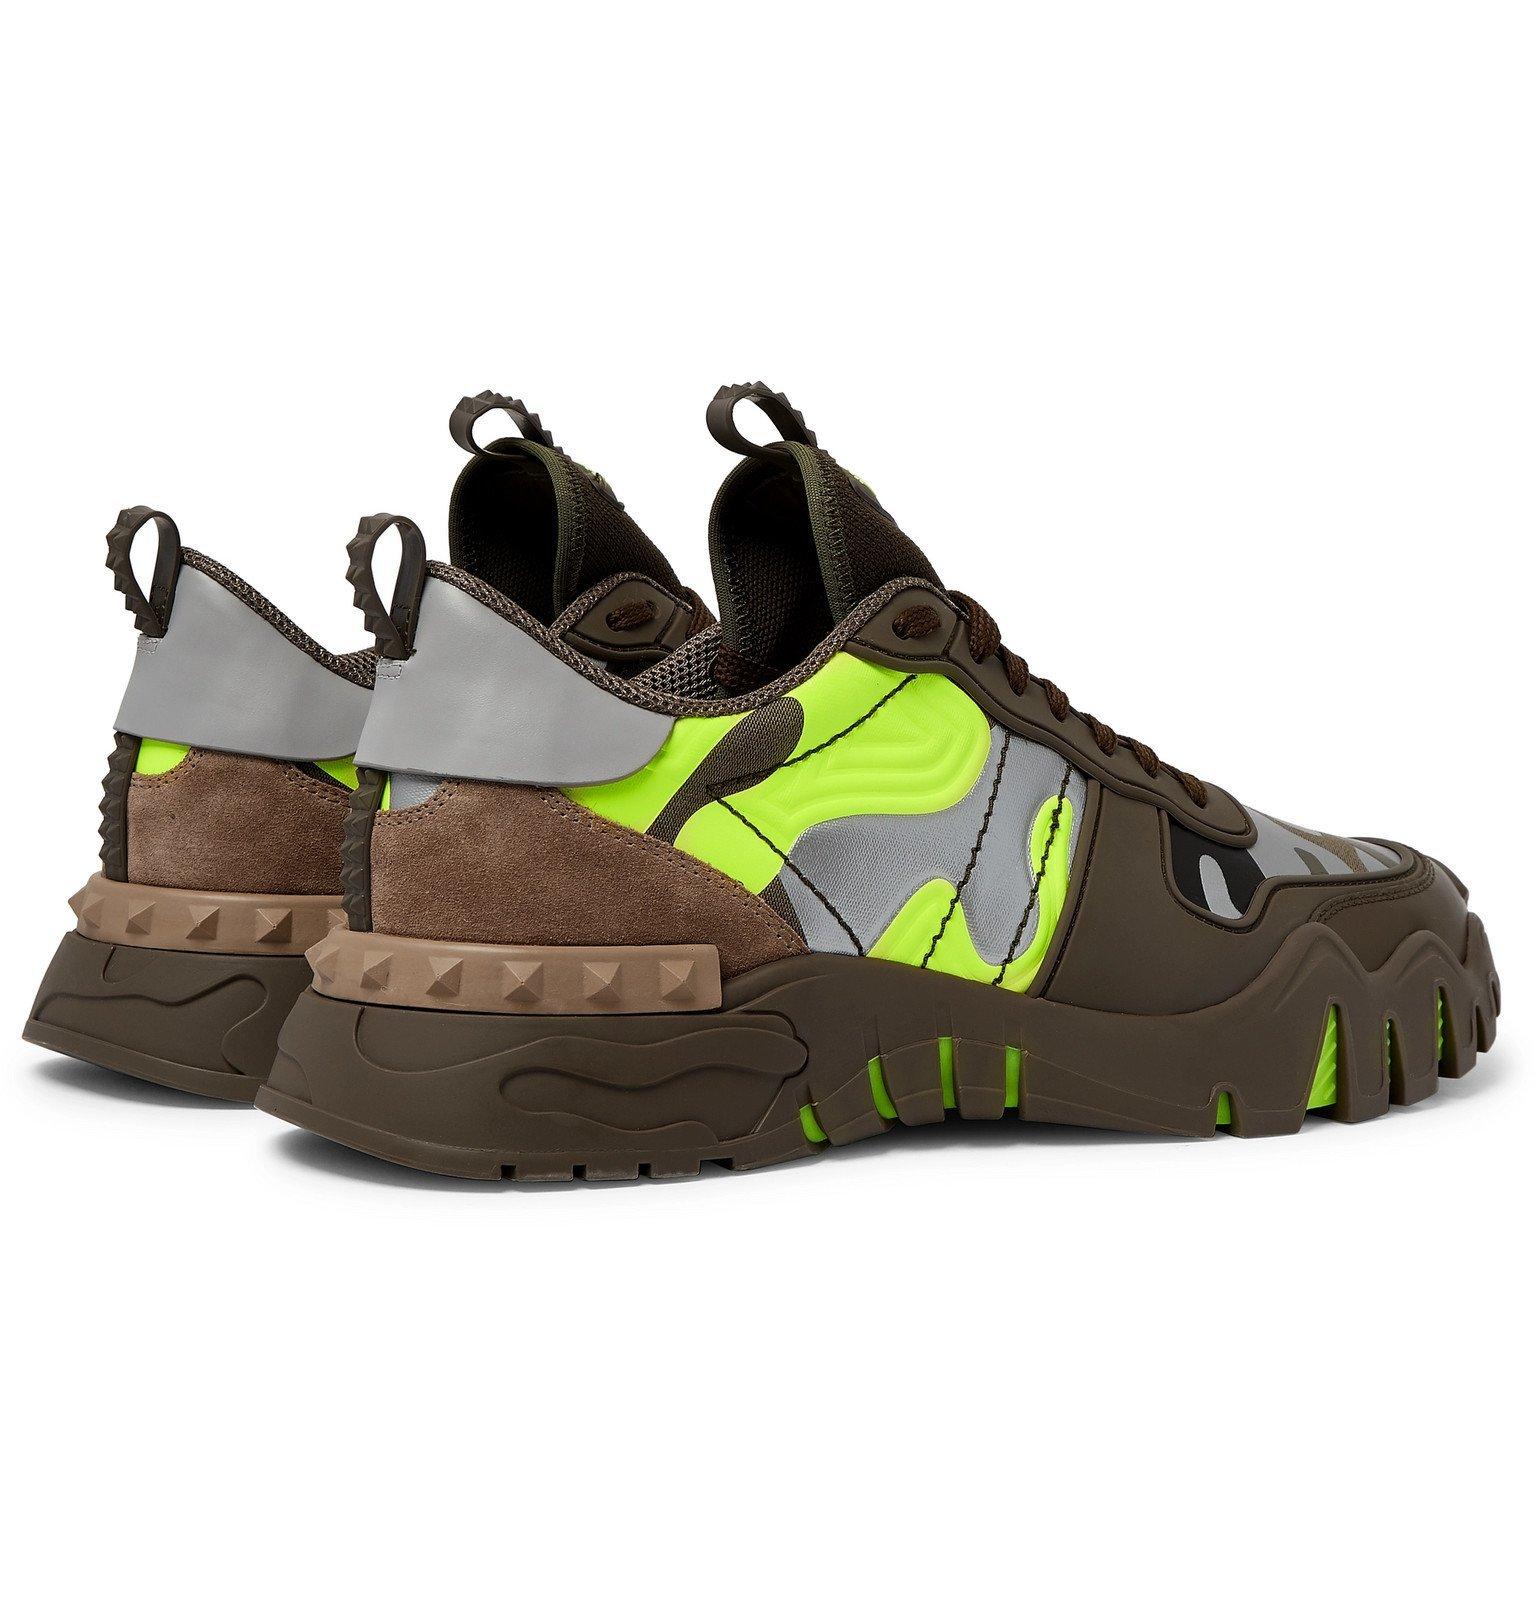 Valentino - Valentino Garavani Rockrunner Plus Rubber, Suede and Canvas Sneakers - Green